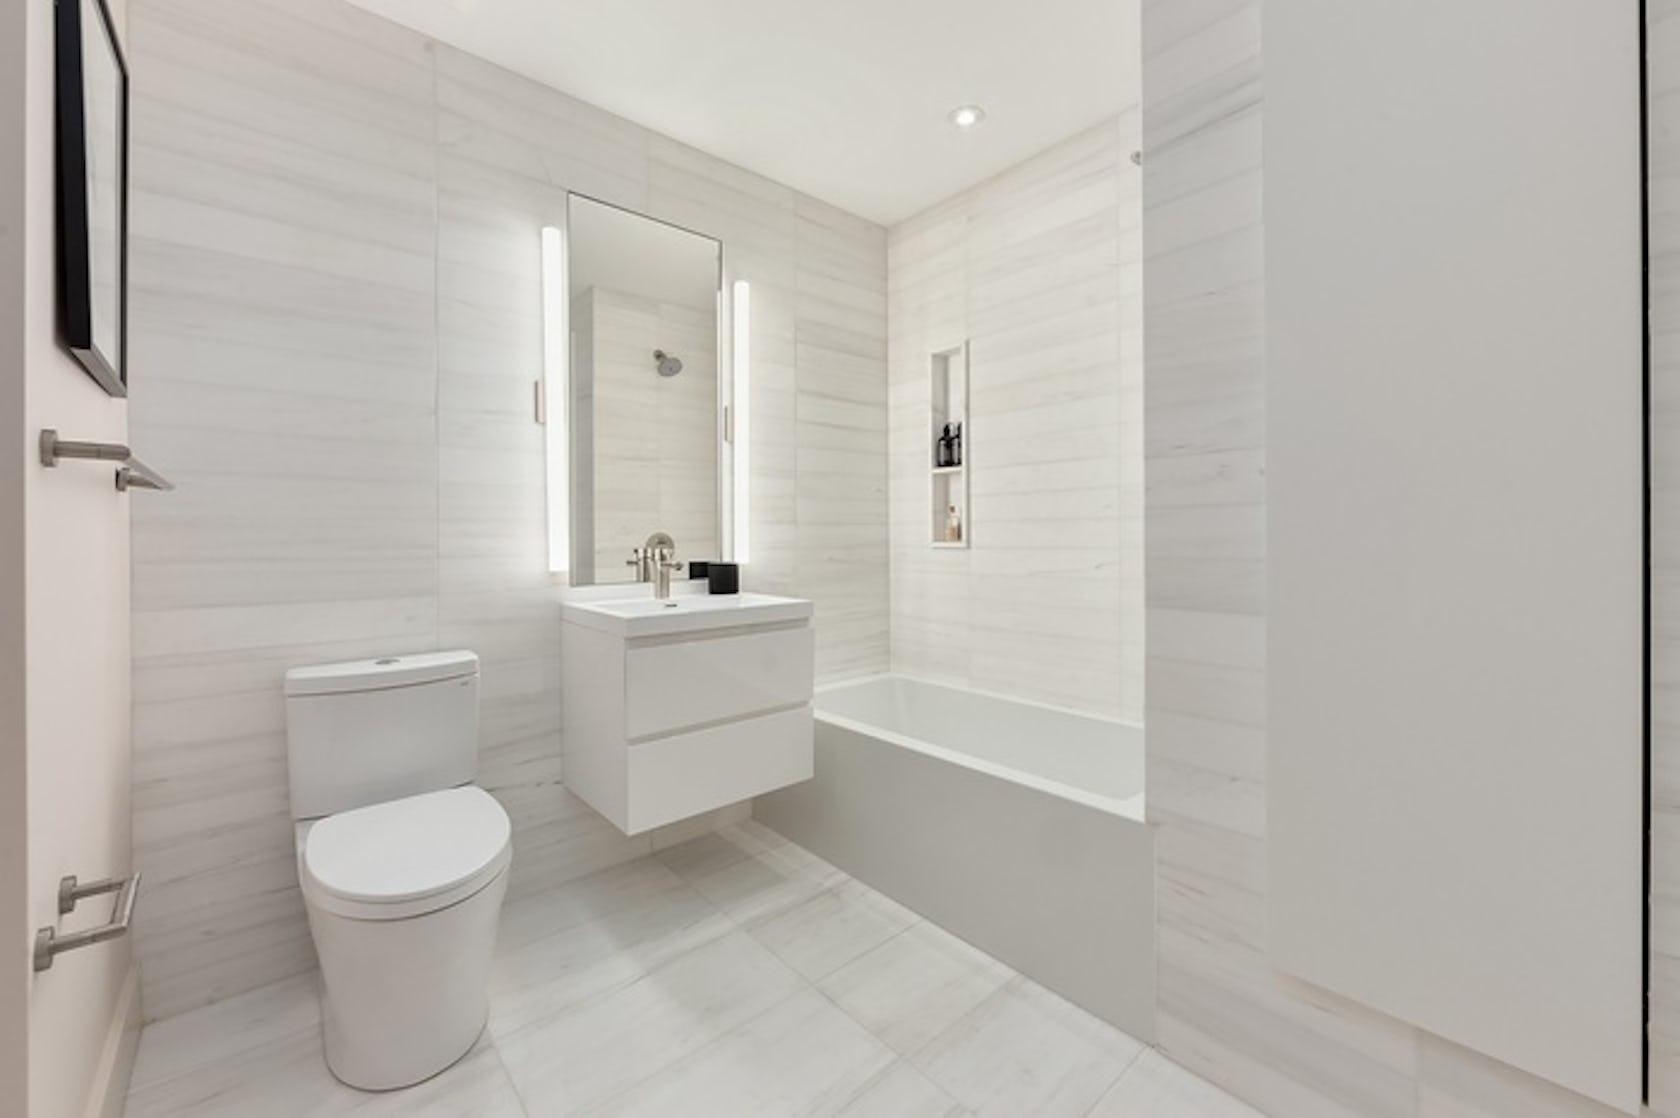 room indoors bathroom toilet